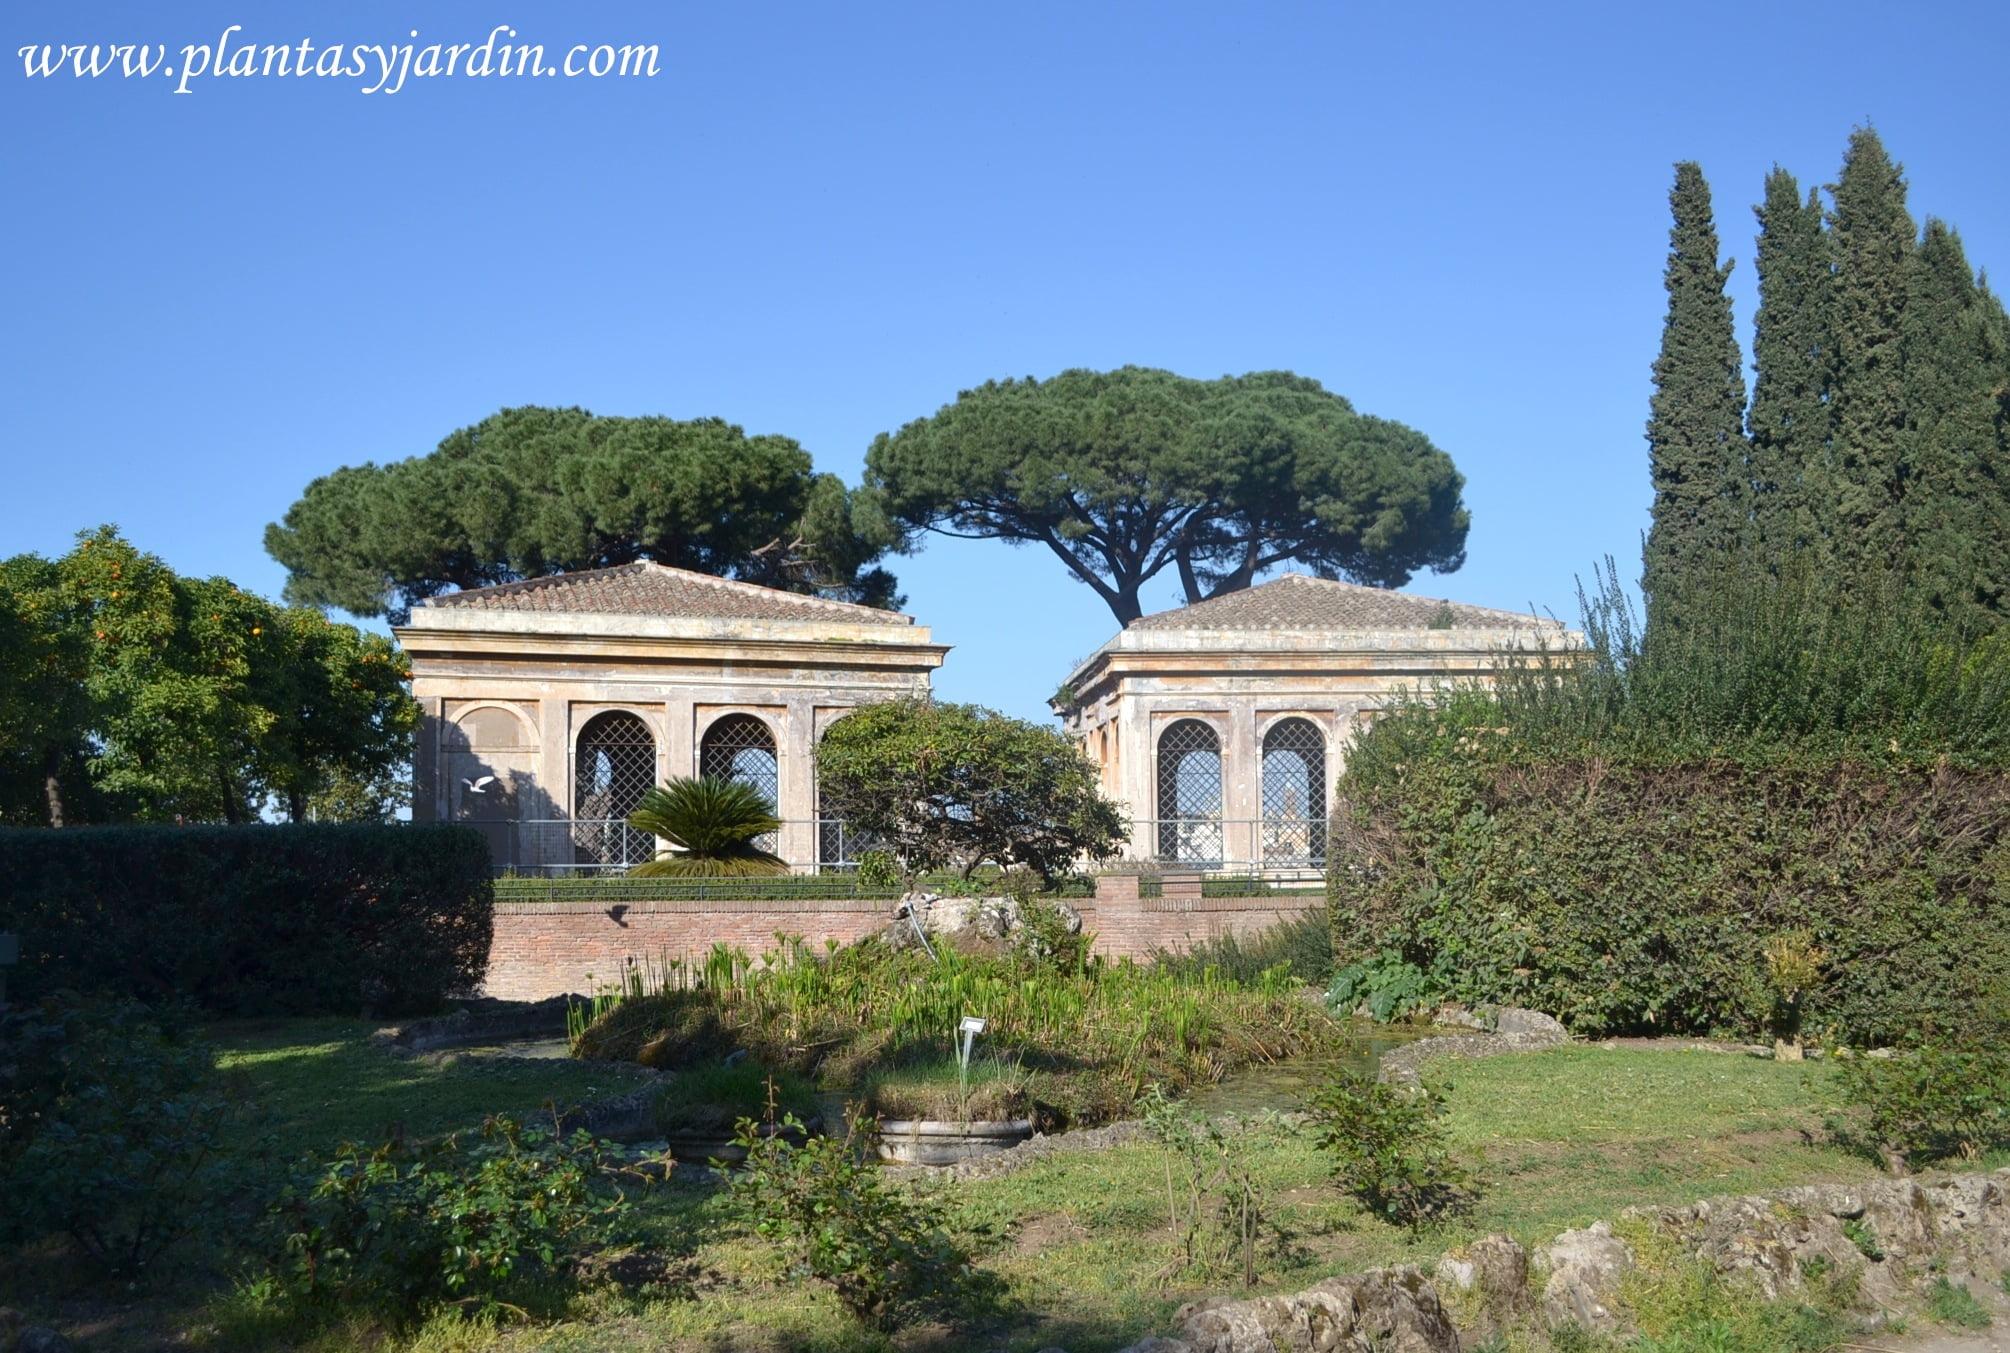 Horti Farnesiani-Jardines Farnesianos-Farnese Gardens en el Monte Palatino, foro romano